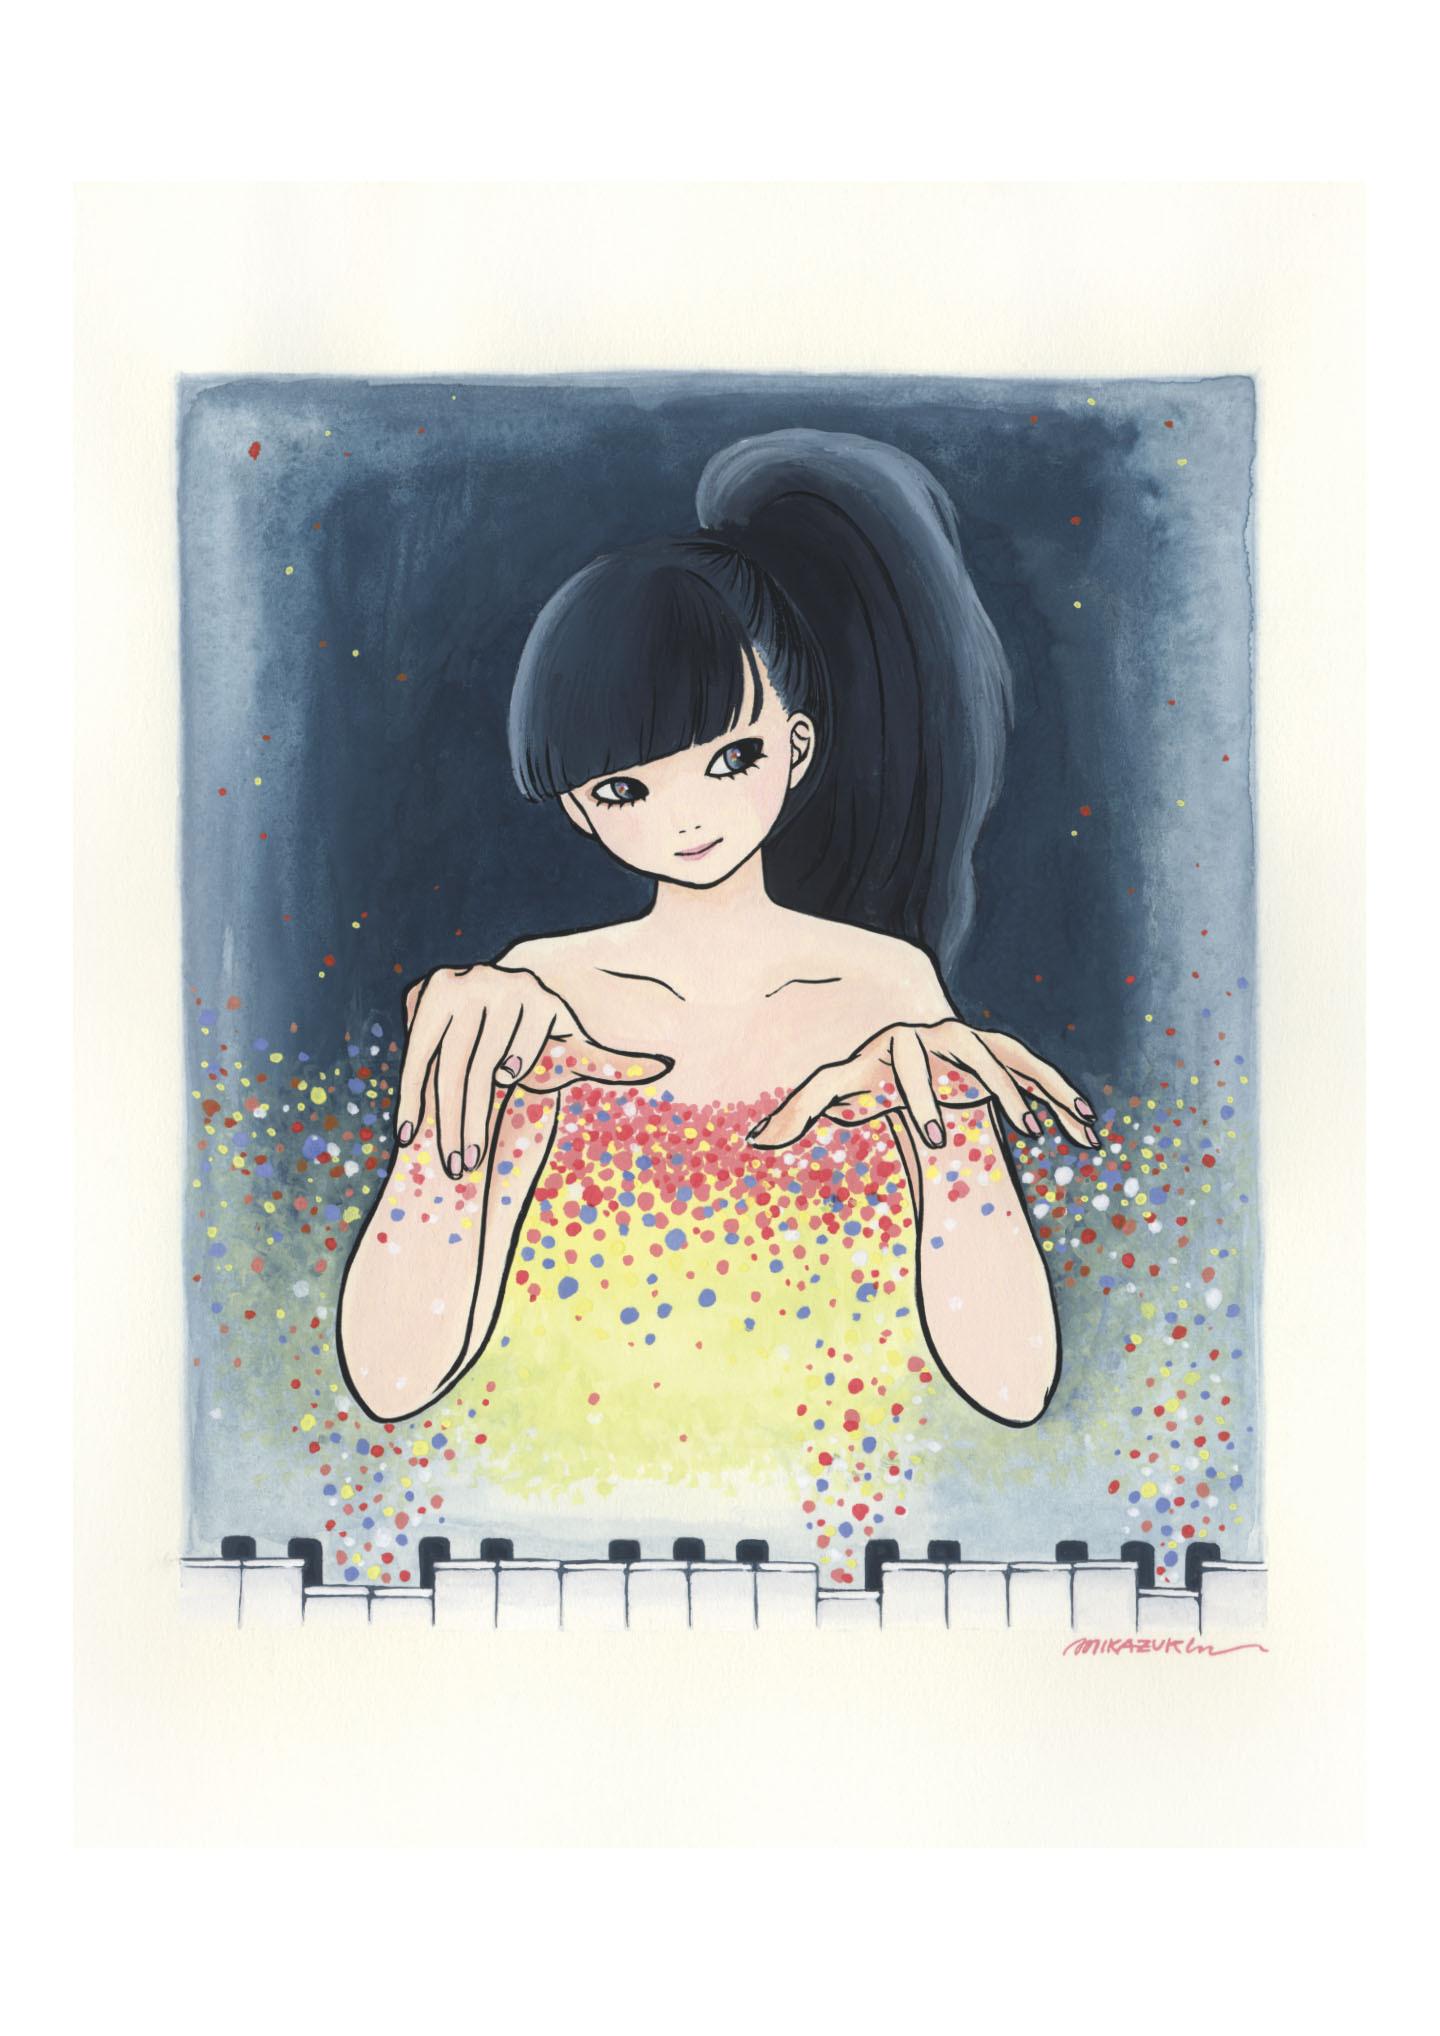 MIKAZUKI / ミカヅキ ミニポスター A4サイズ 「Magic」